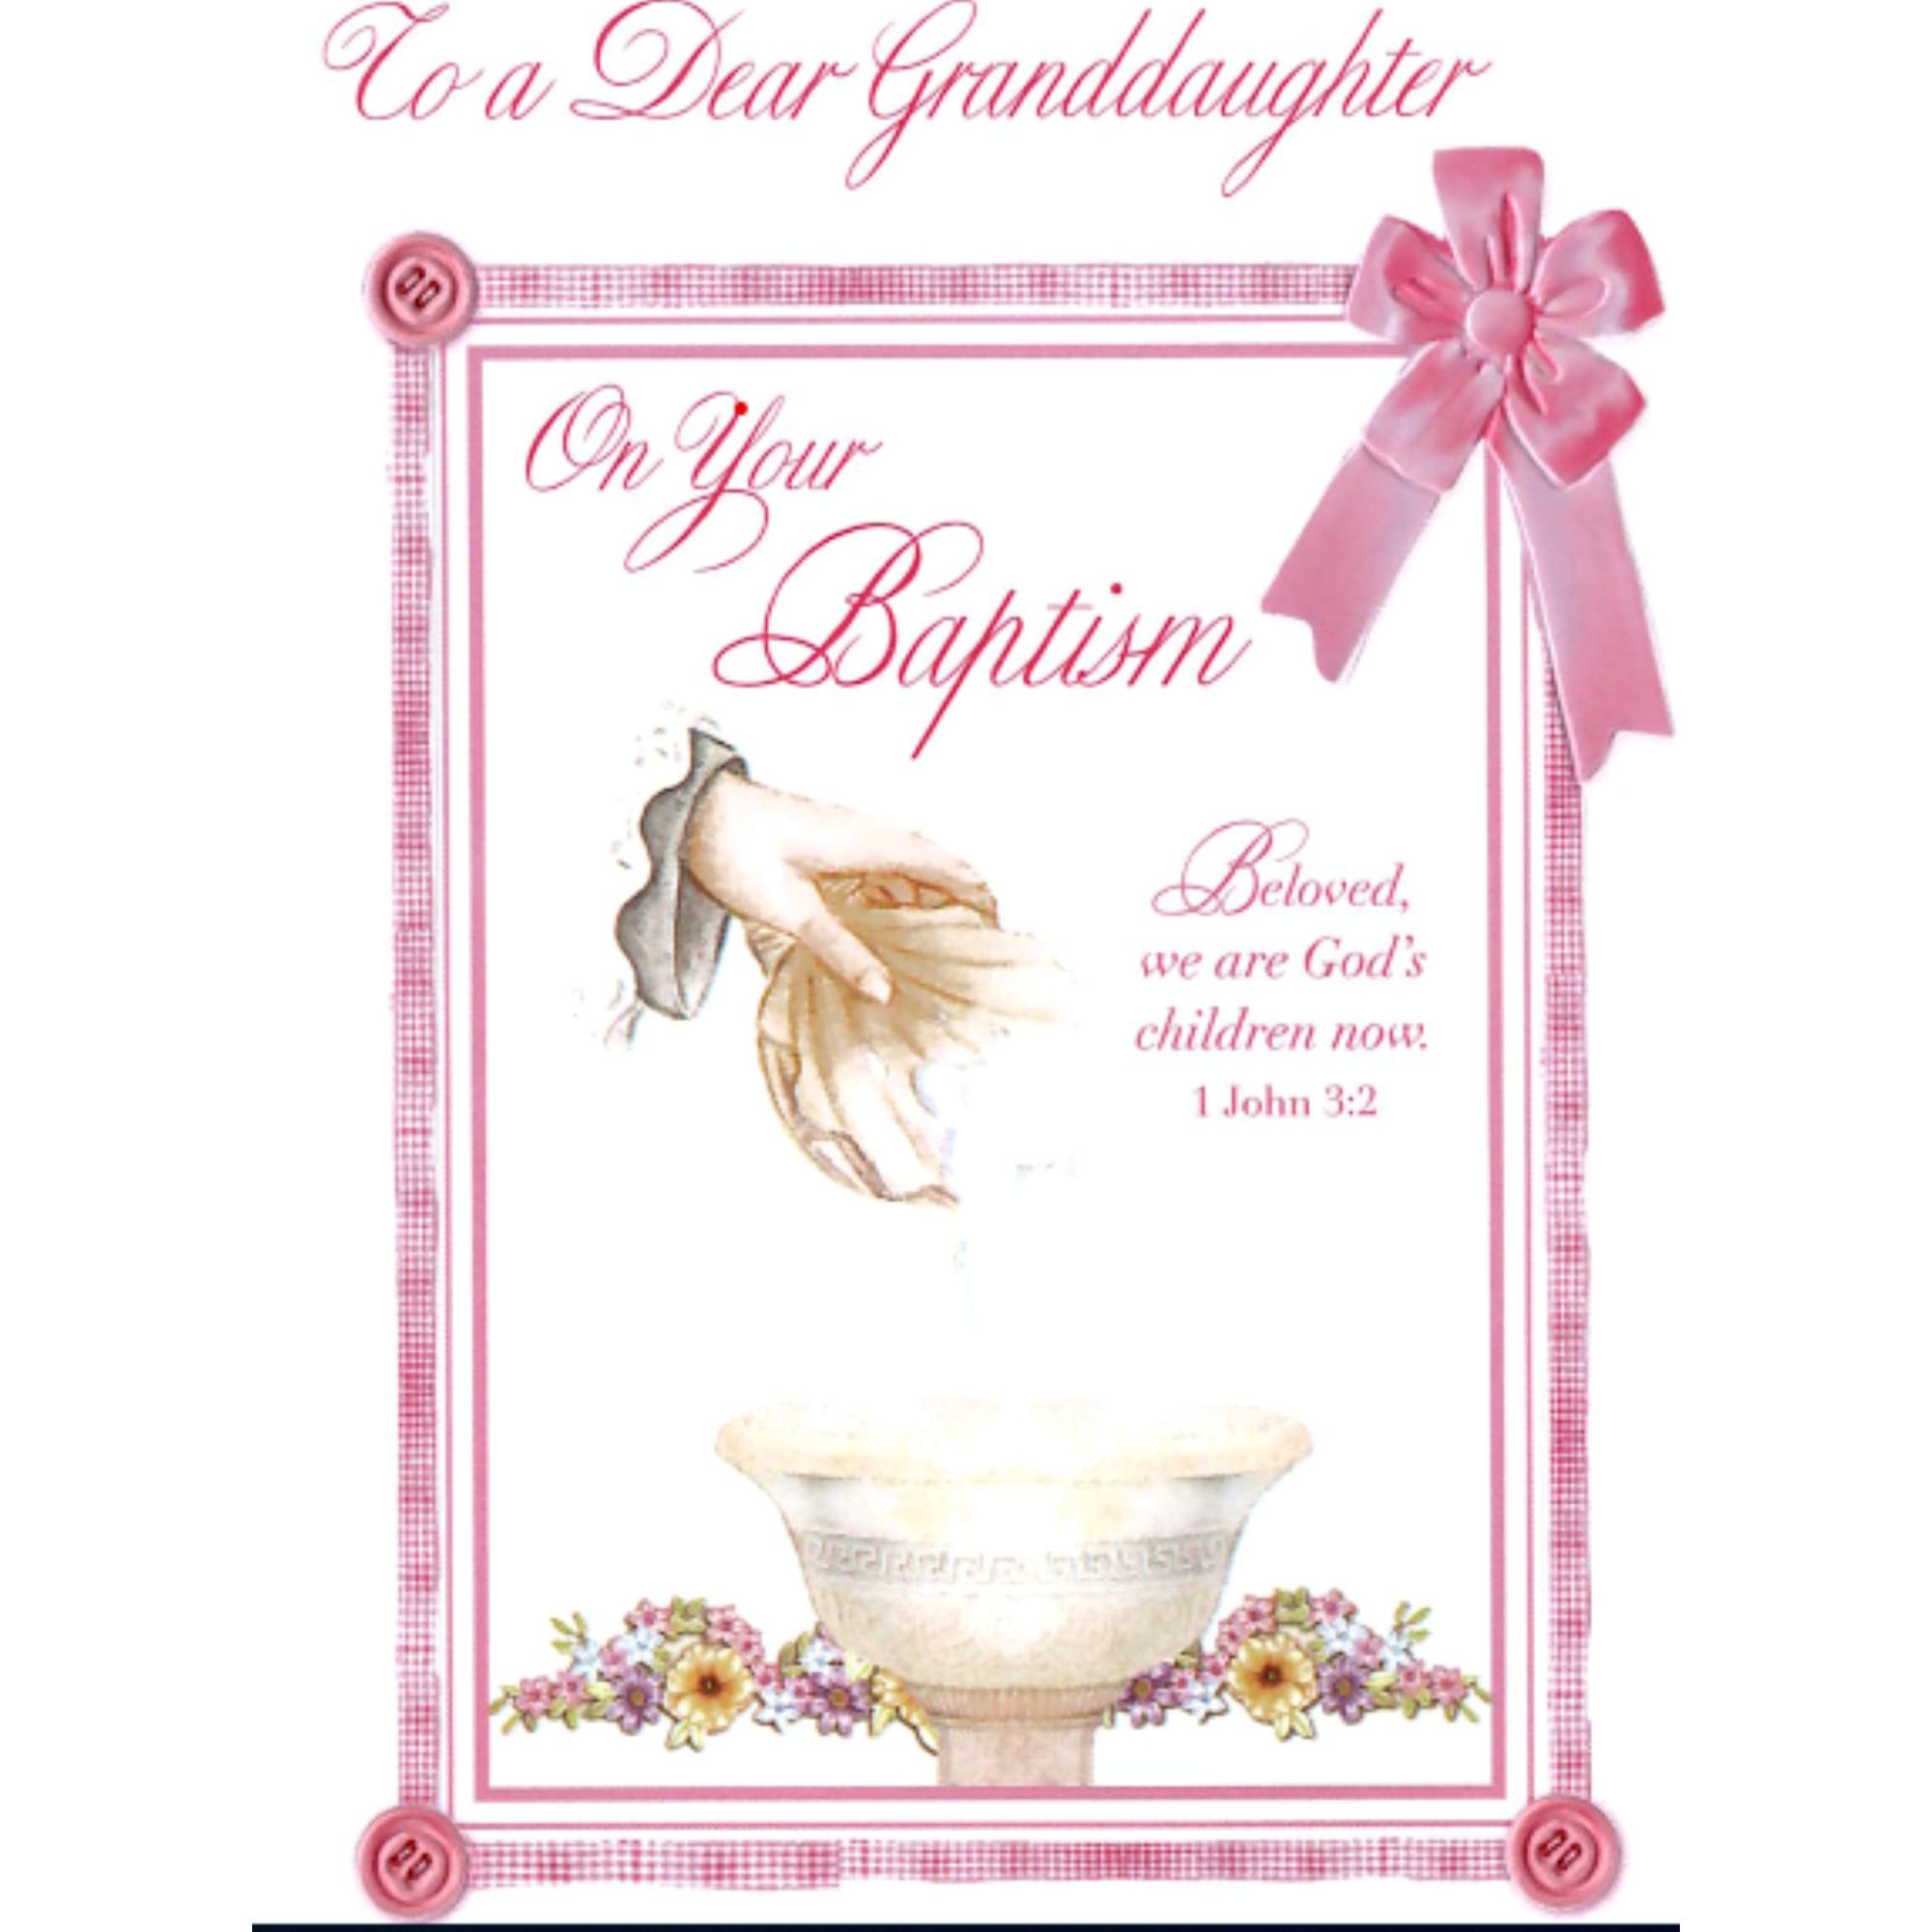 Baptism Greeting Card Granddaughter The Catholic Company